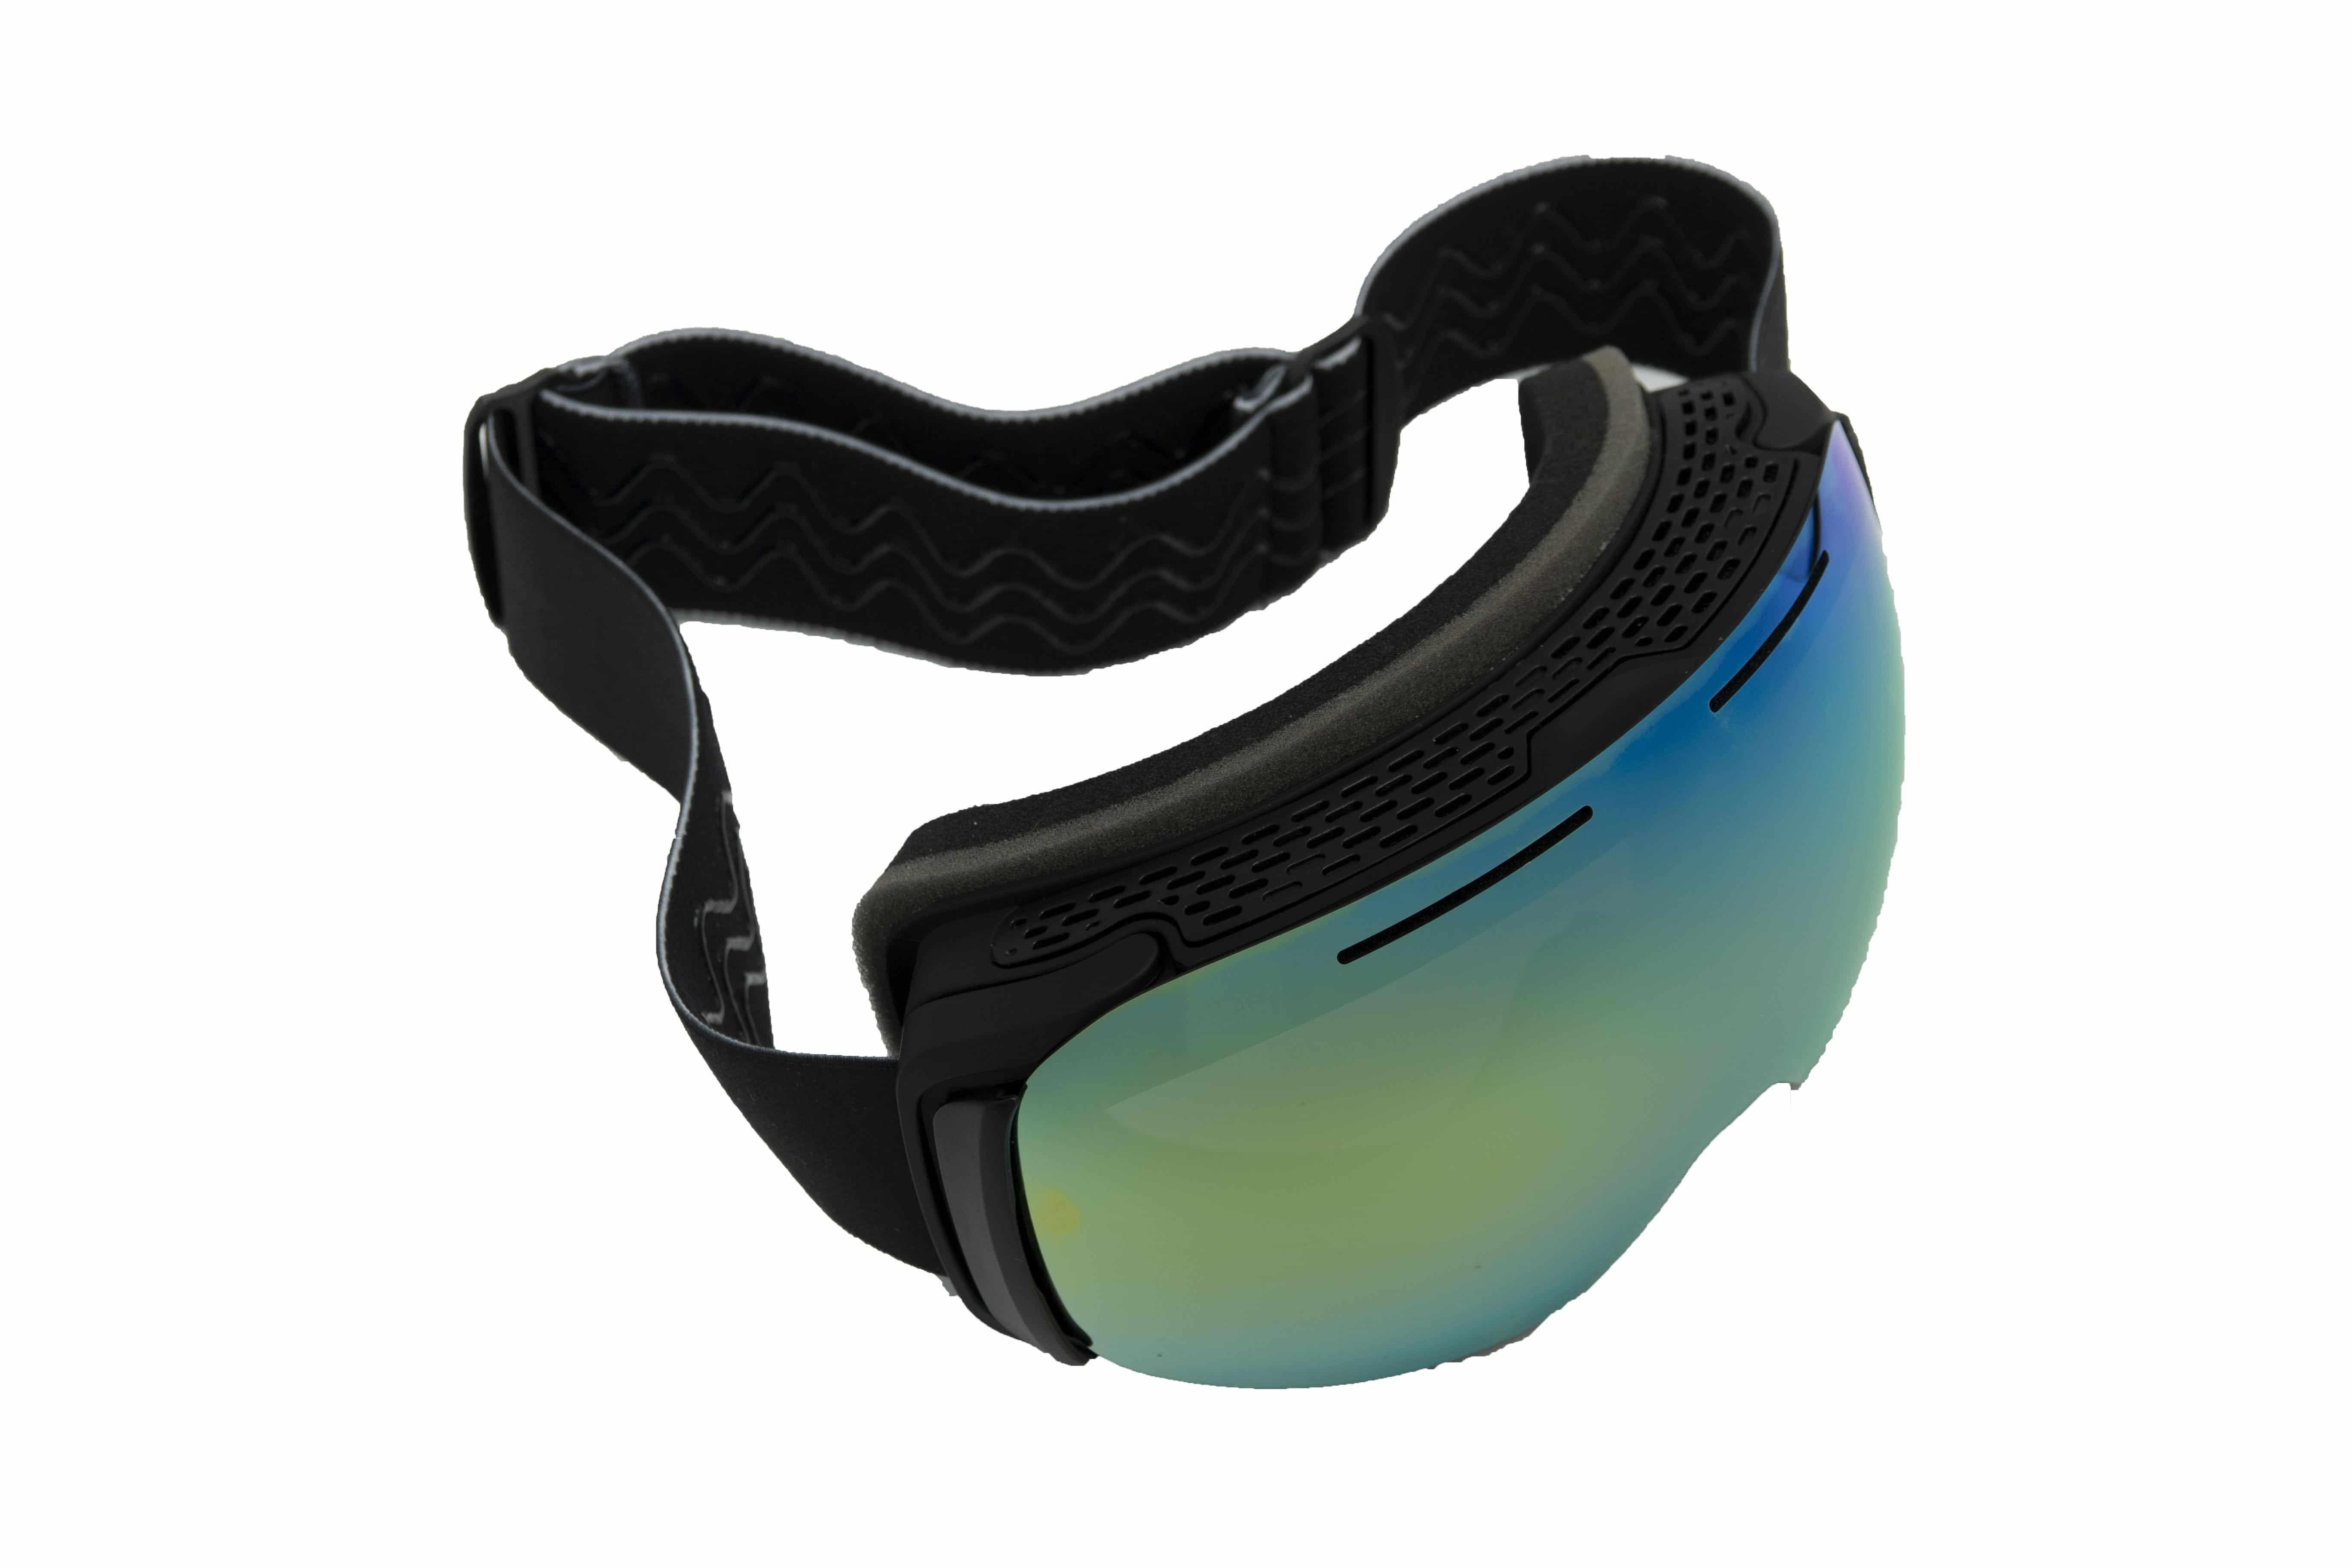 5one® Alpine 7 - skibril - 2 verwisselbare lenzen - Oranje en Goud